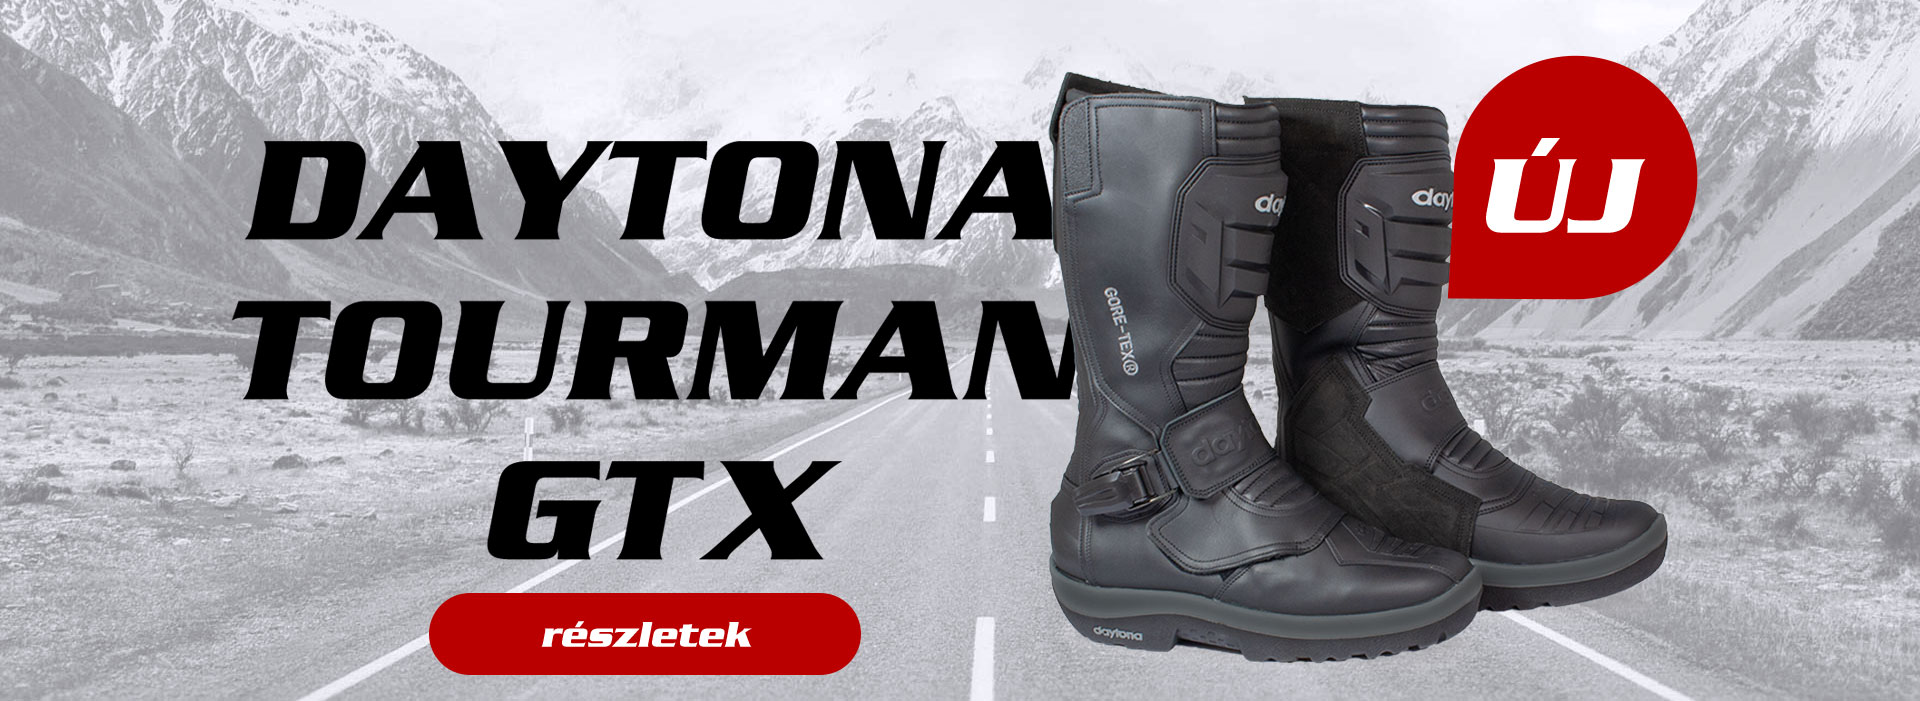 Daytona transtourman gtx